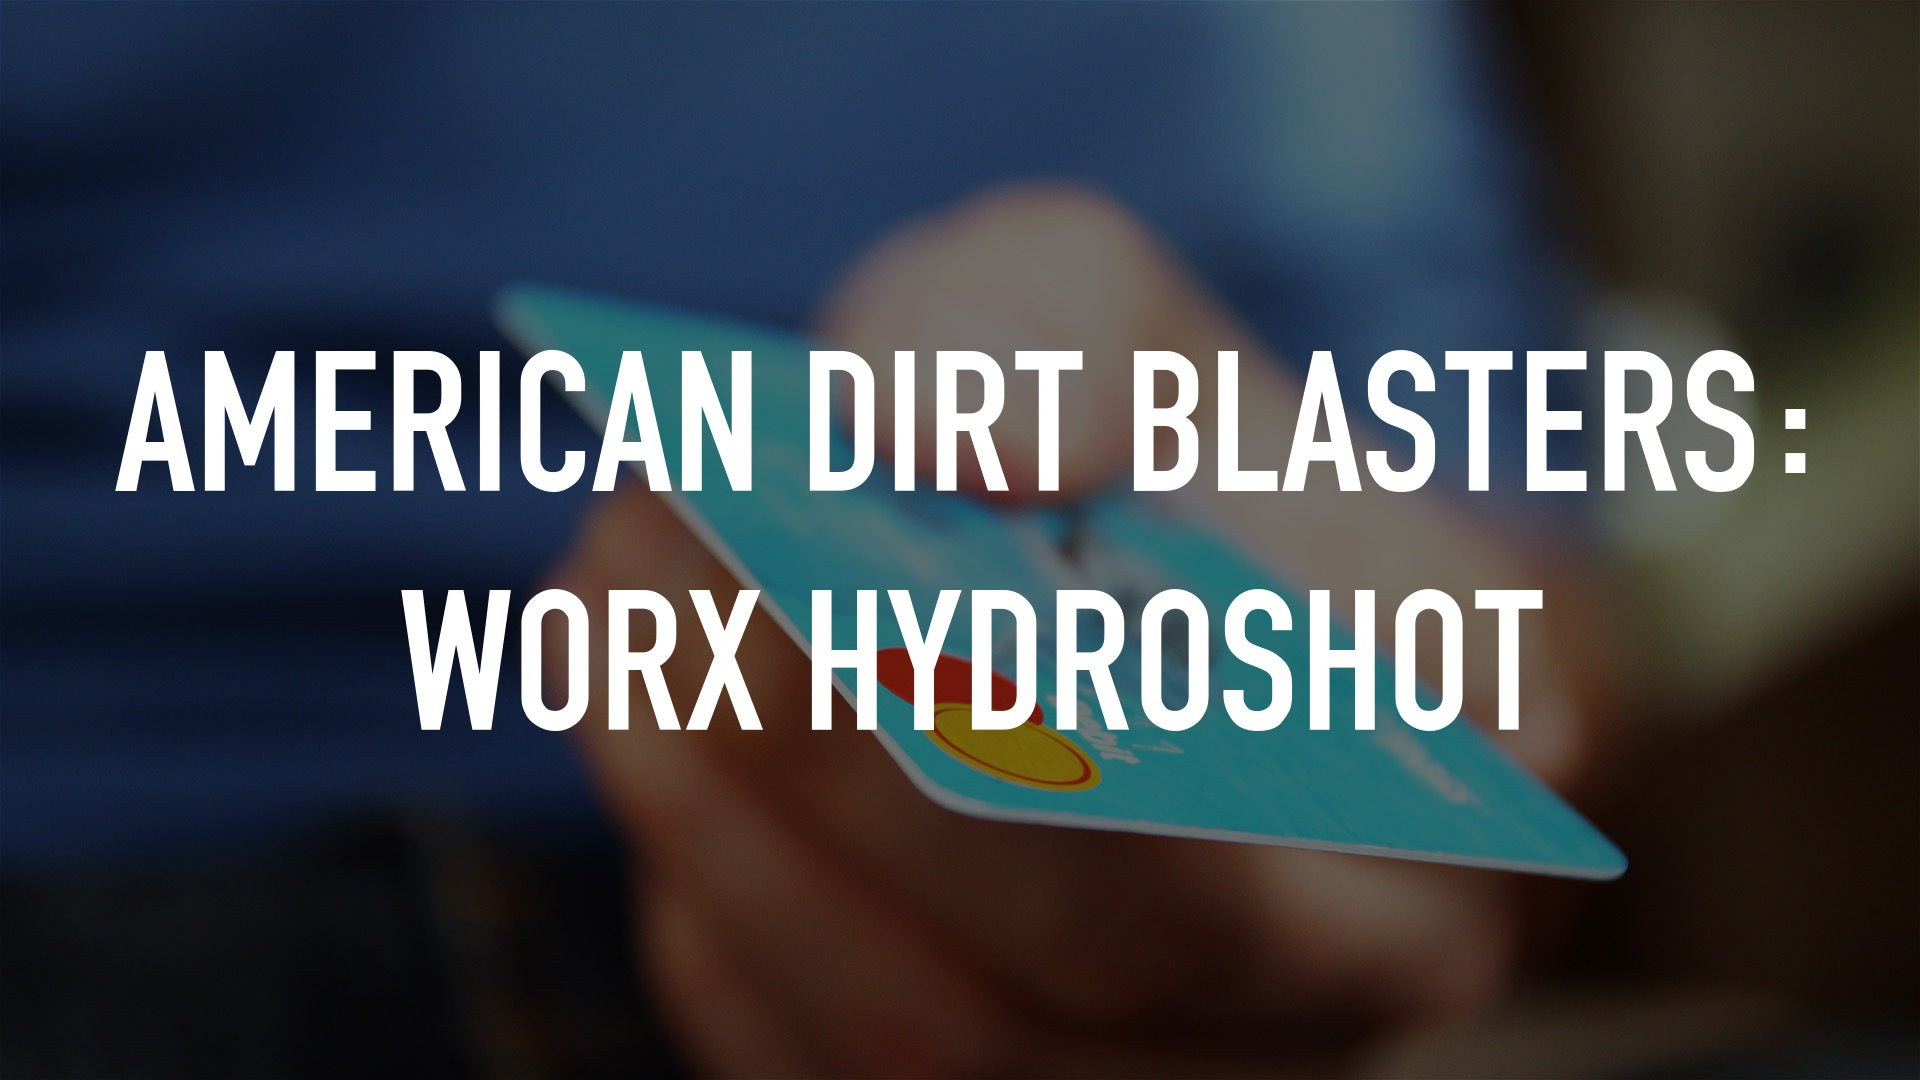 American Dirt Blasters: WORX HydroShot